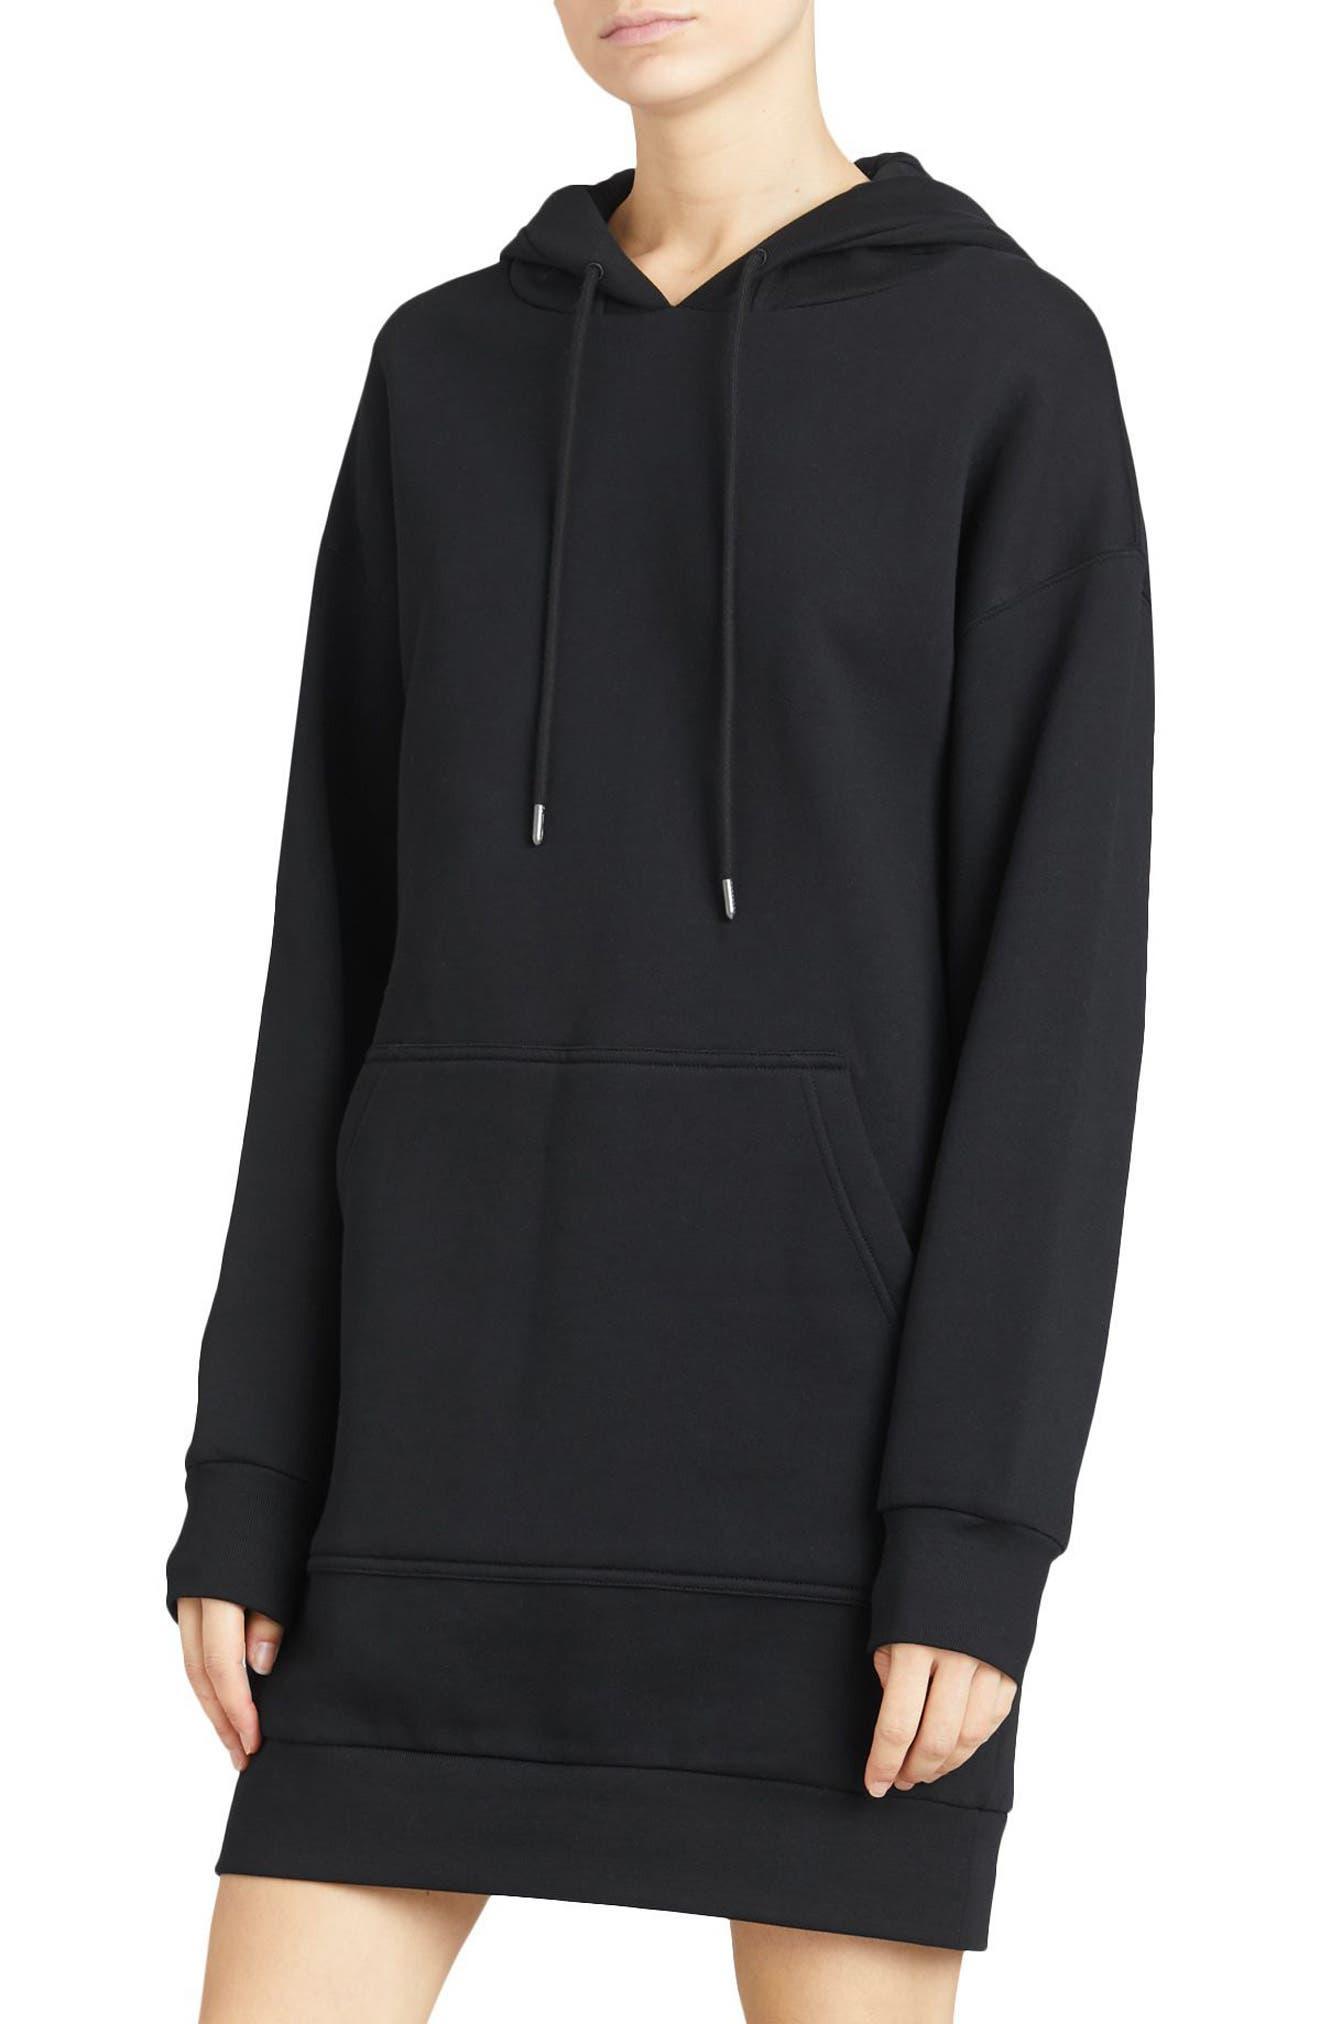 Cardeiver Jersey Sweatshirt Dress,                             Alternate thumbnail 3, color,                             001